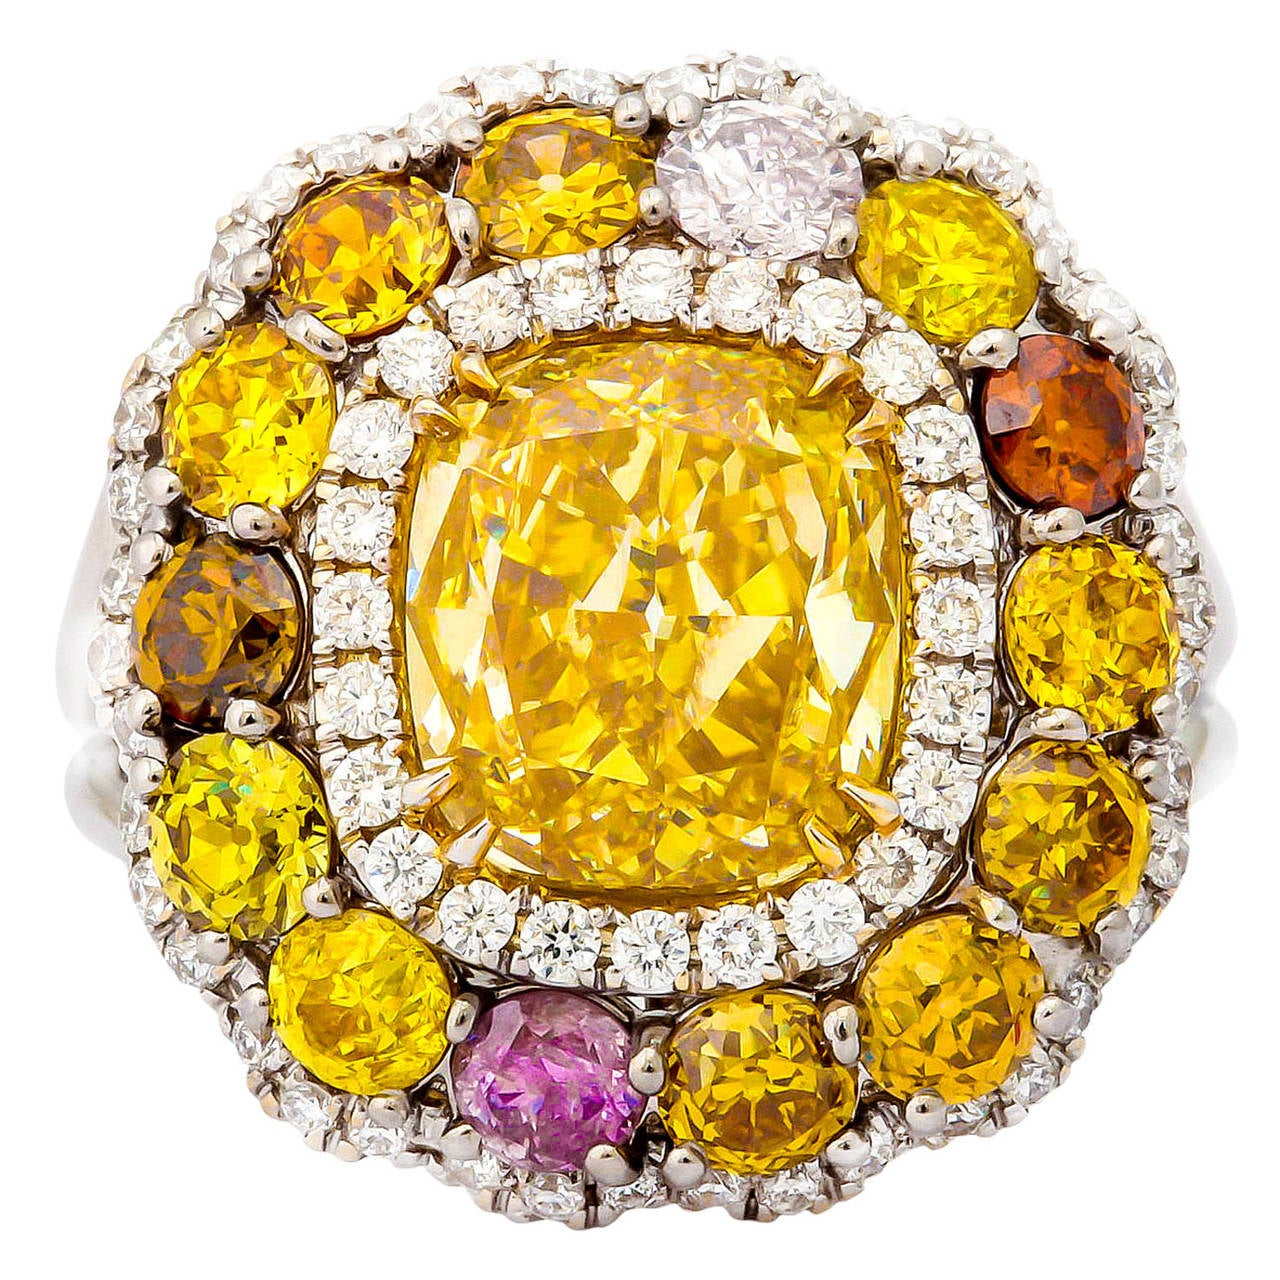 Stunning 3.02 Carat GIA Cert Cushion Cut Diamond Gold Platinum Ring